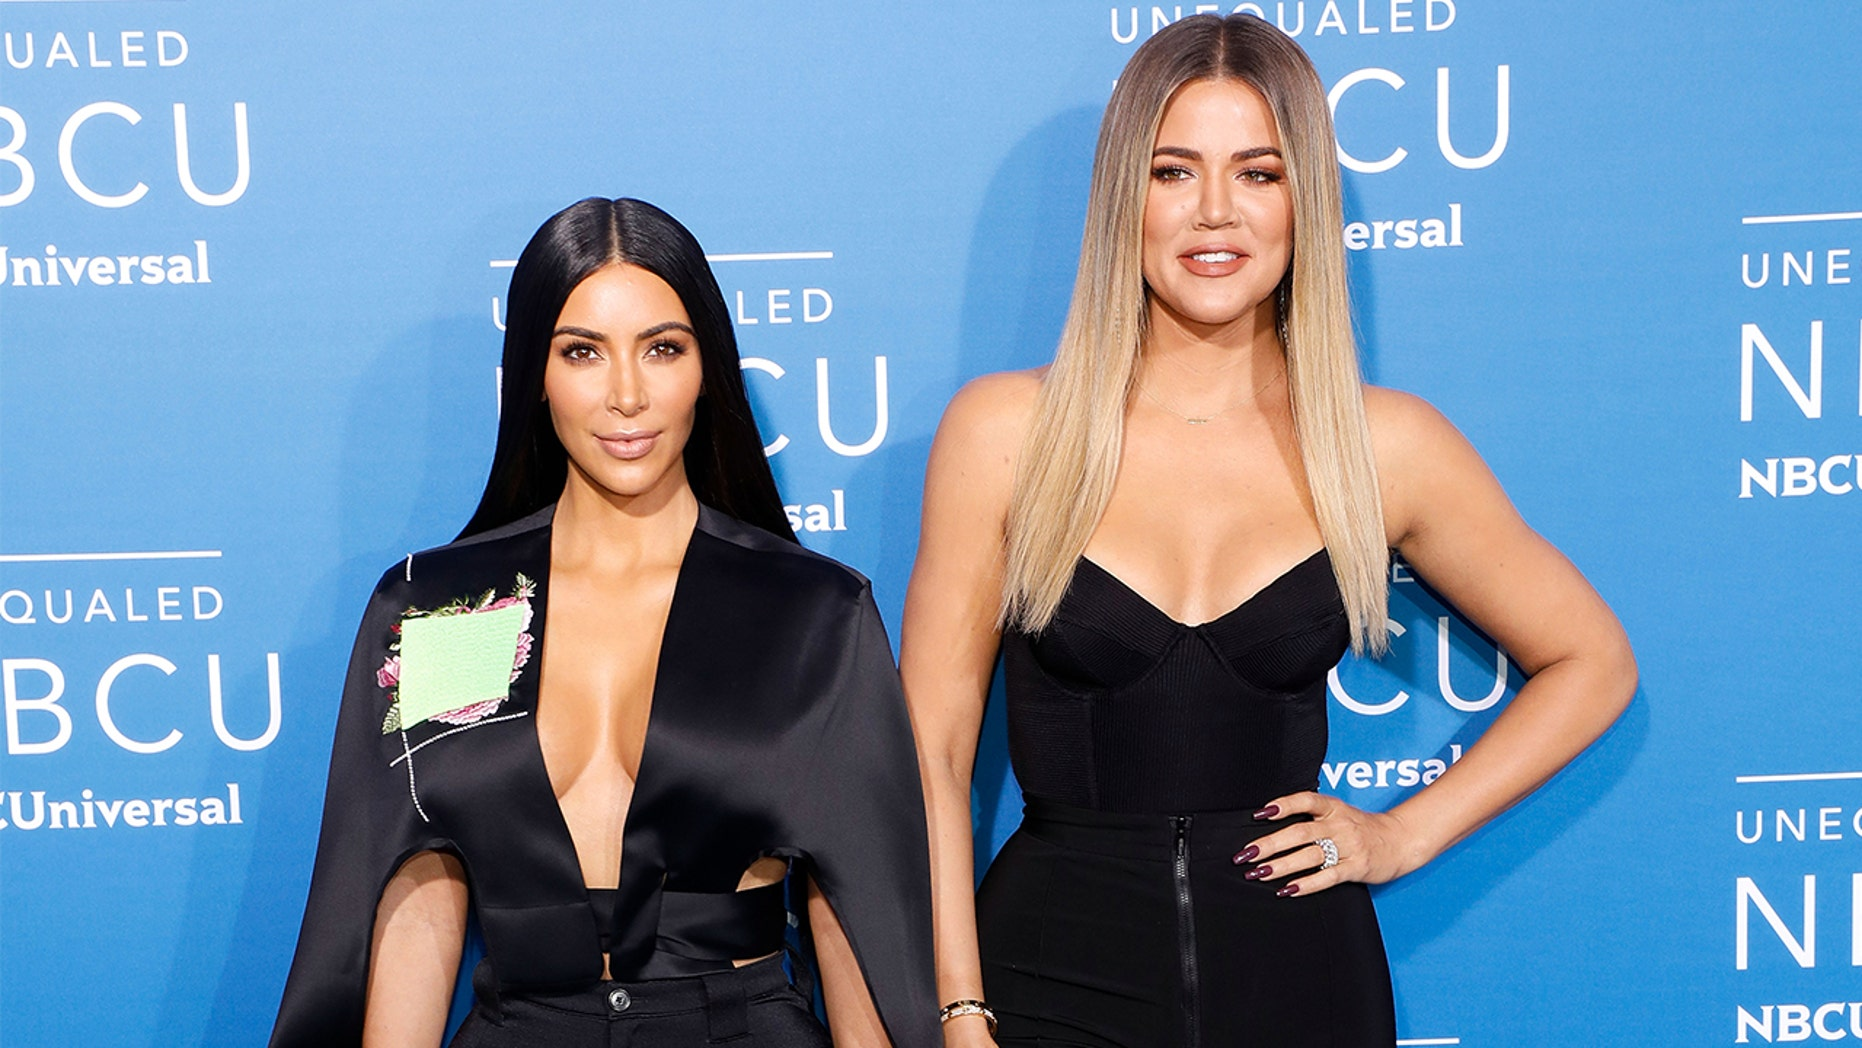 Kim Kardashian West and Khloe Kardashian pictured here in May 2017.